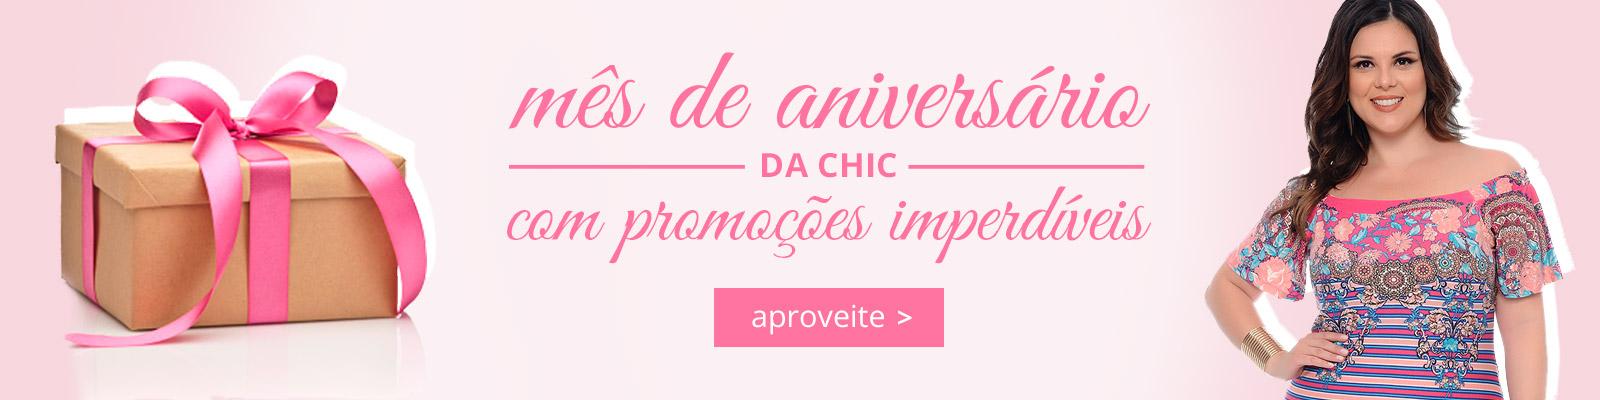 Aniversario CHIC